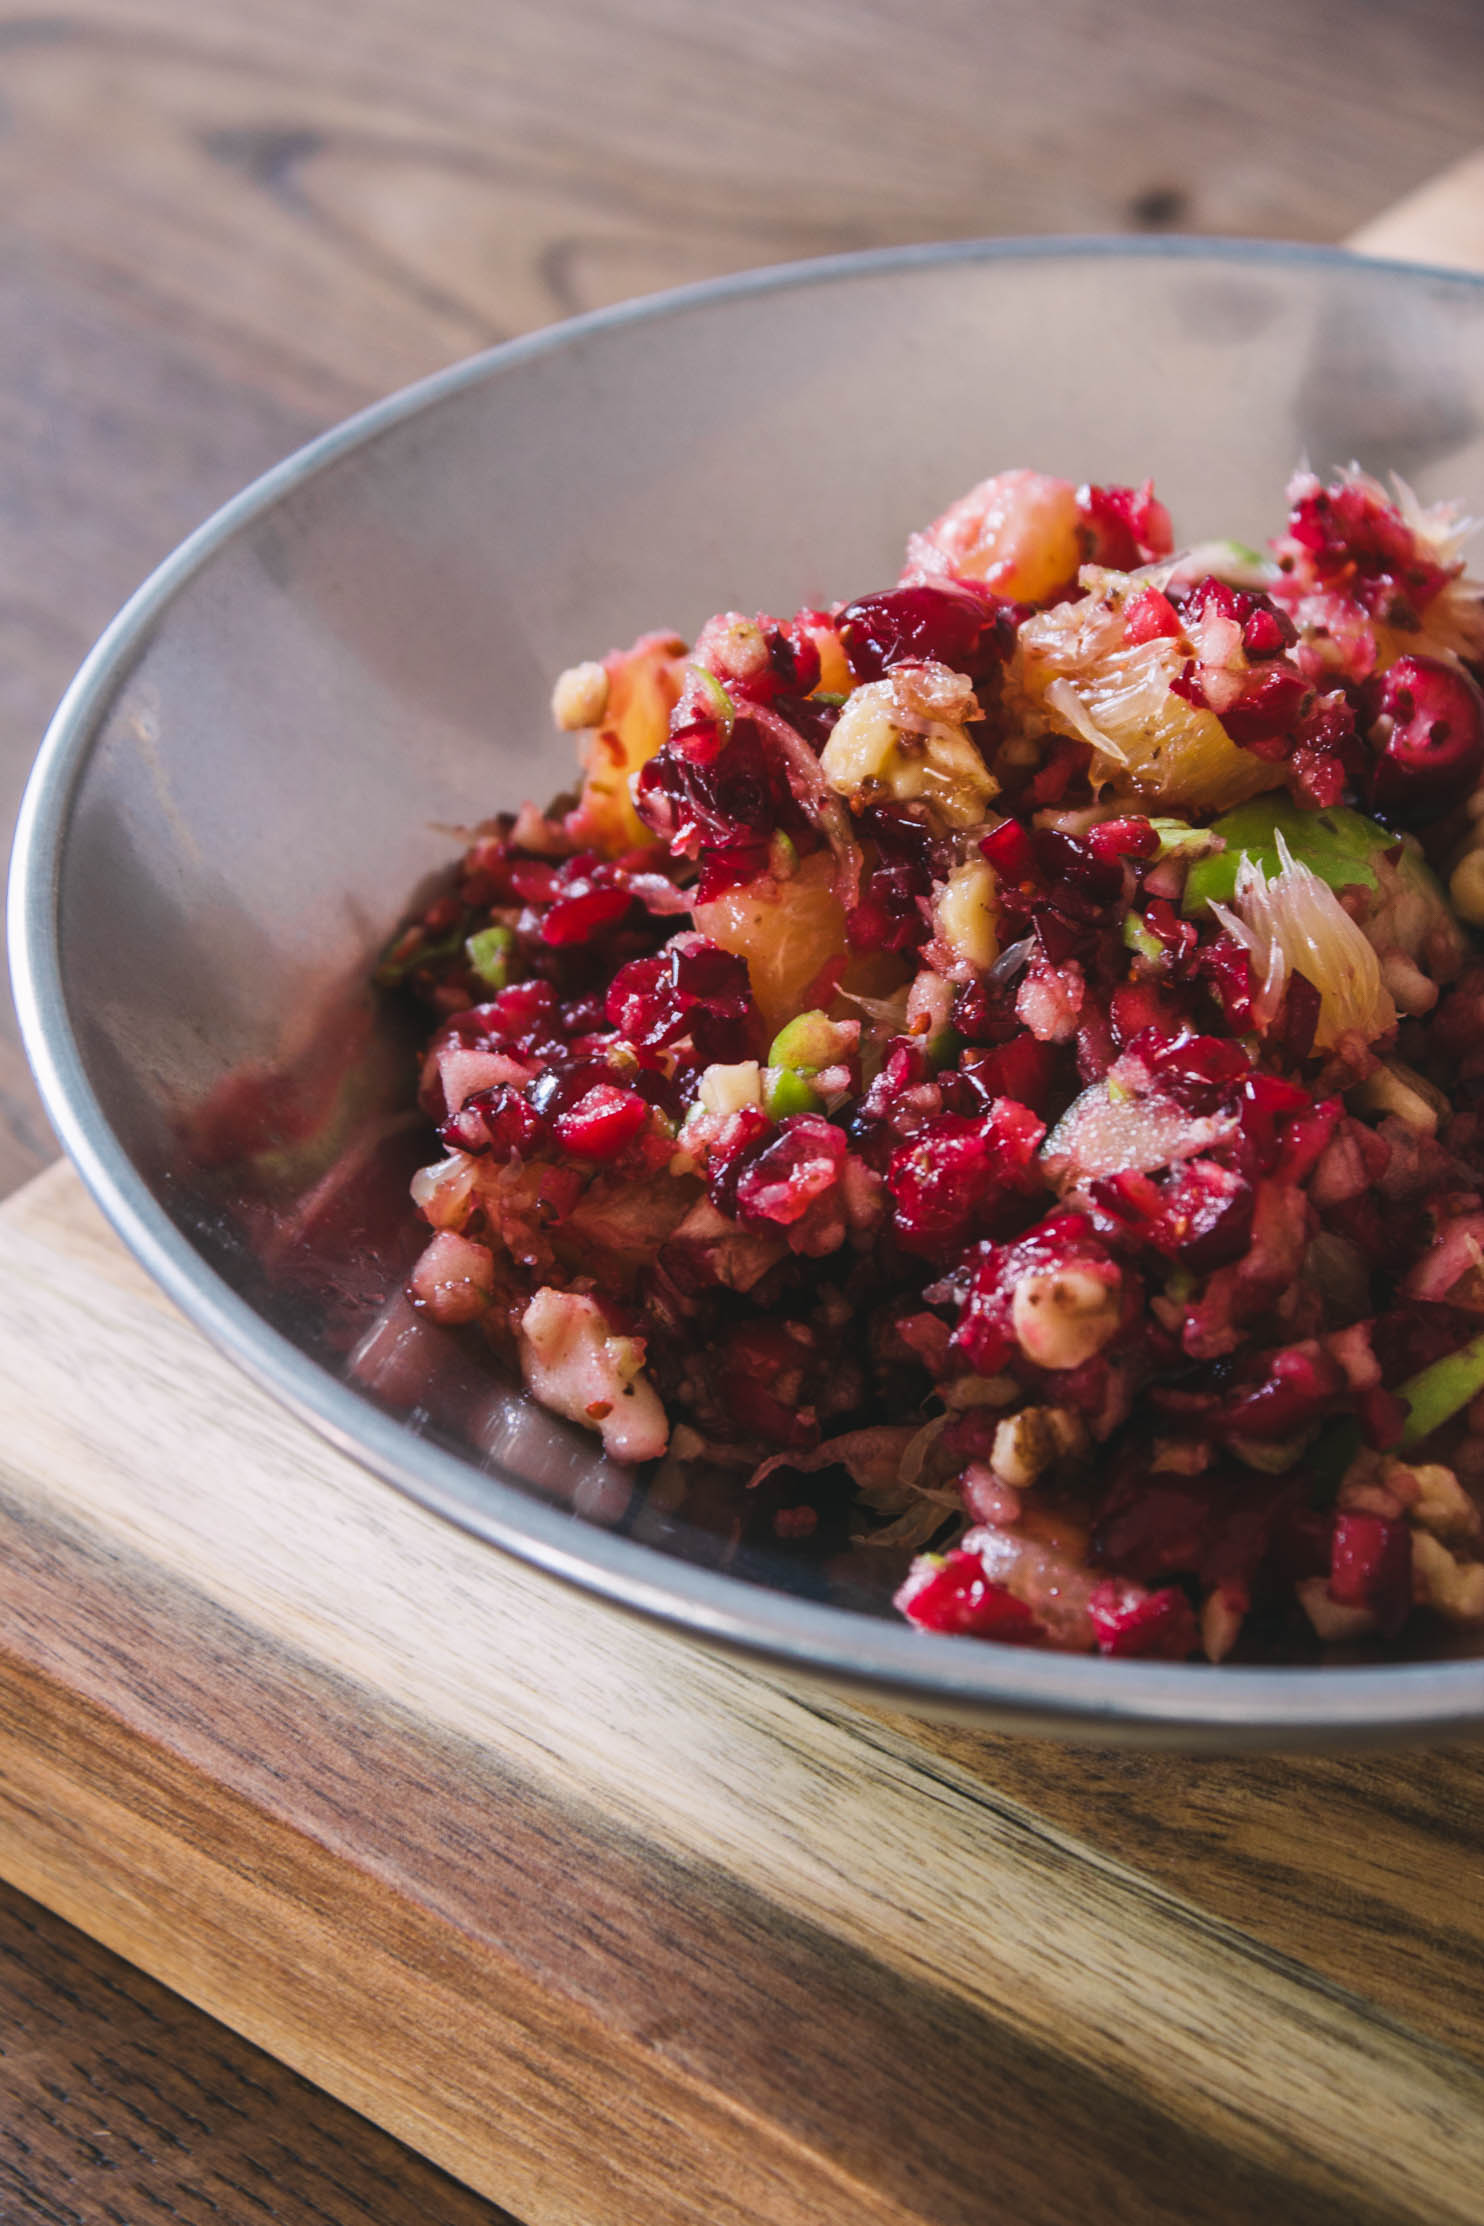 1-Bowl Raw Cranberry Fruit Salad #relish #thanksgiving #christmas #fruit salad